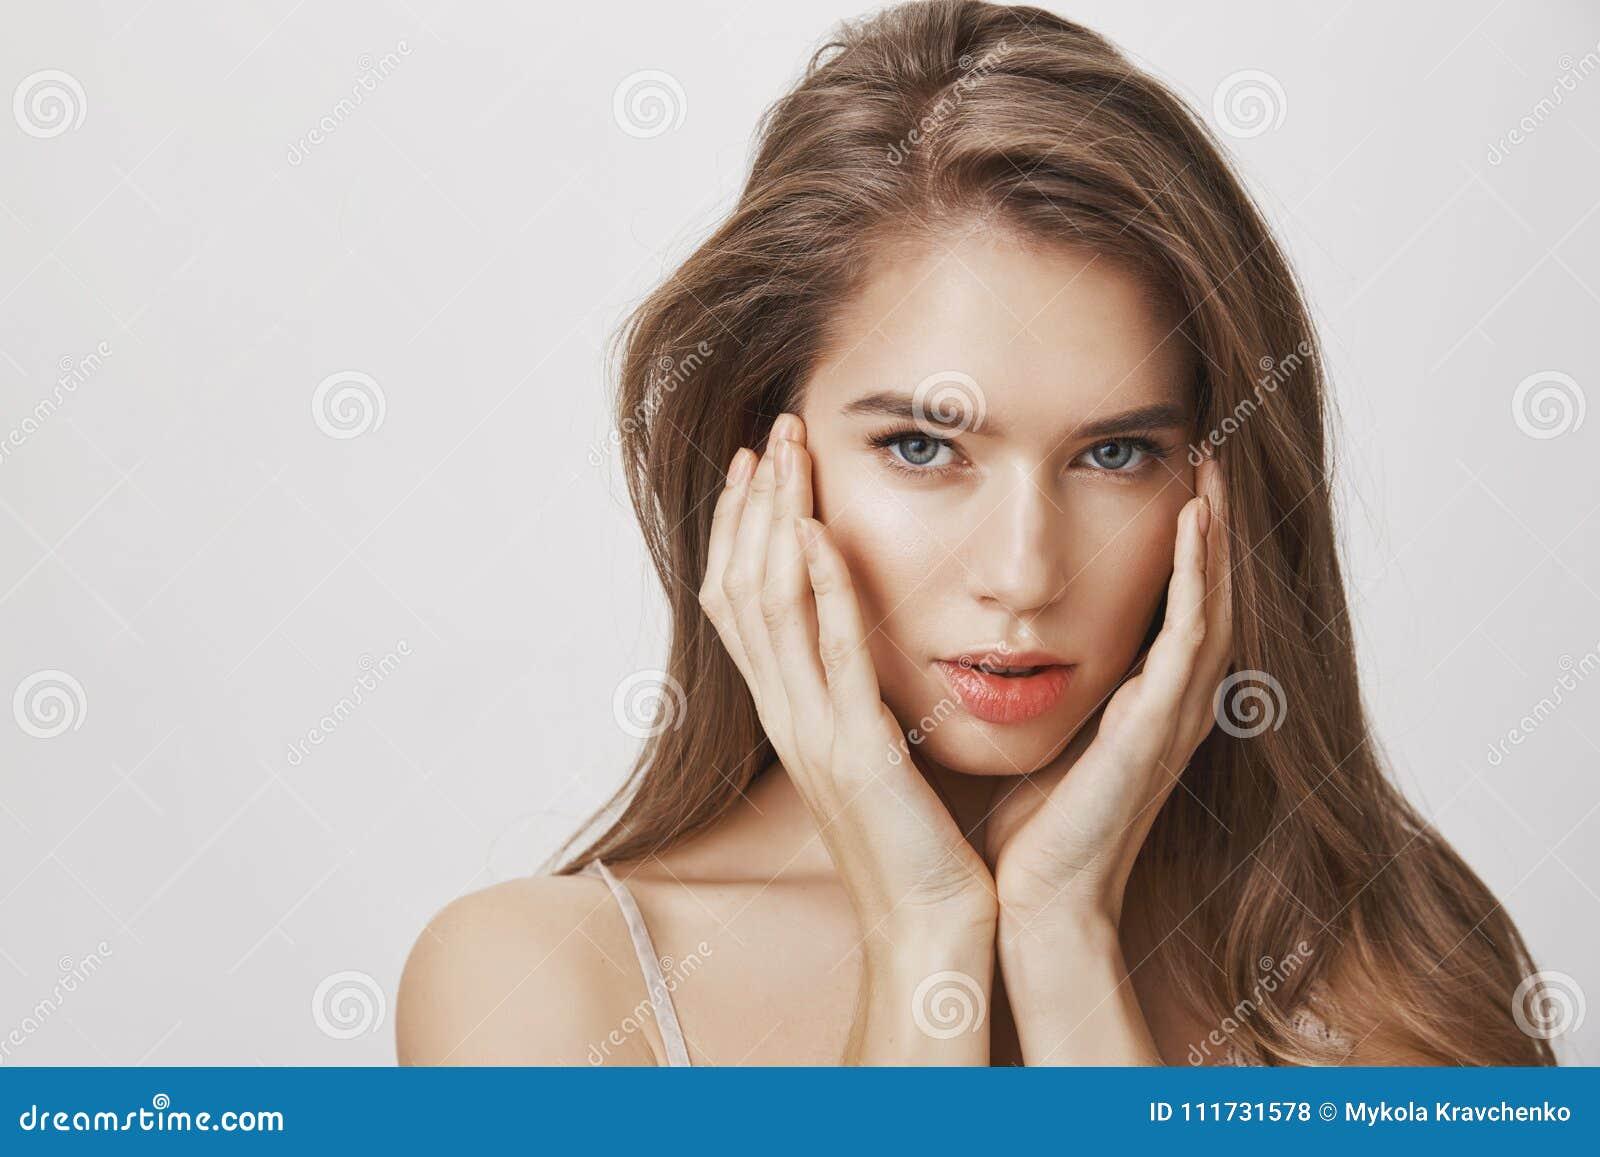 Attractive facial features woman